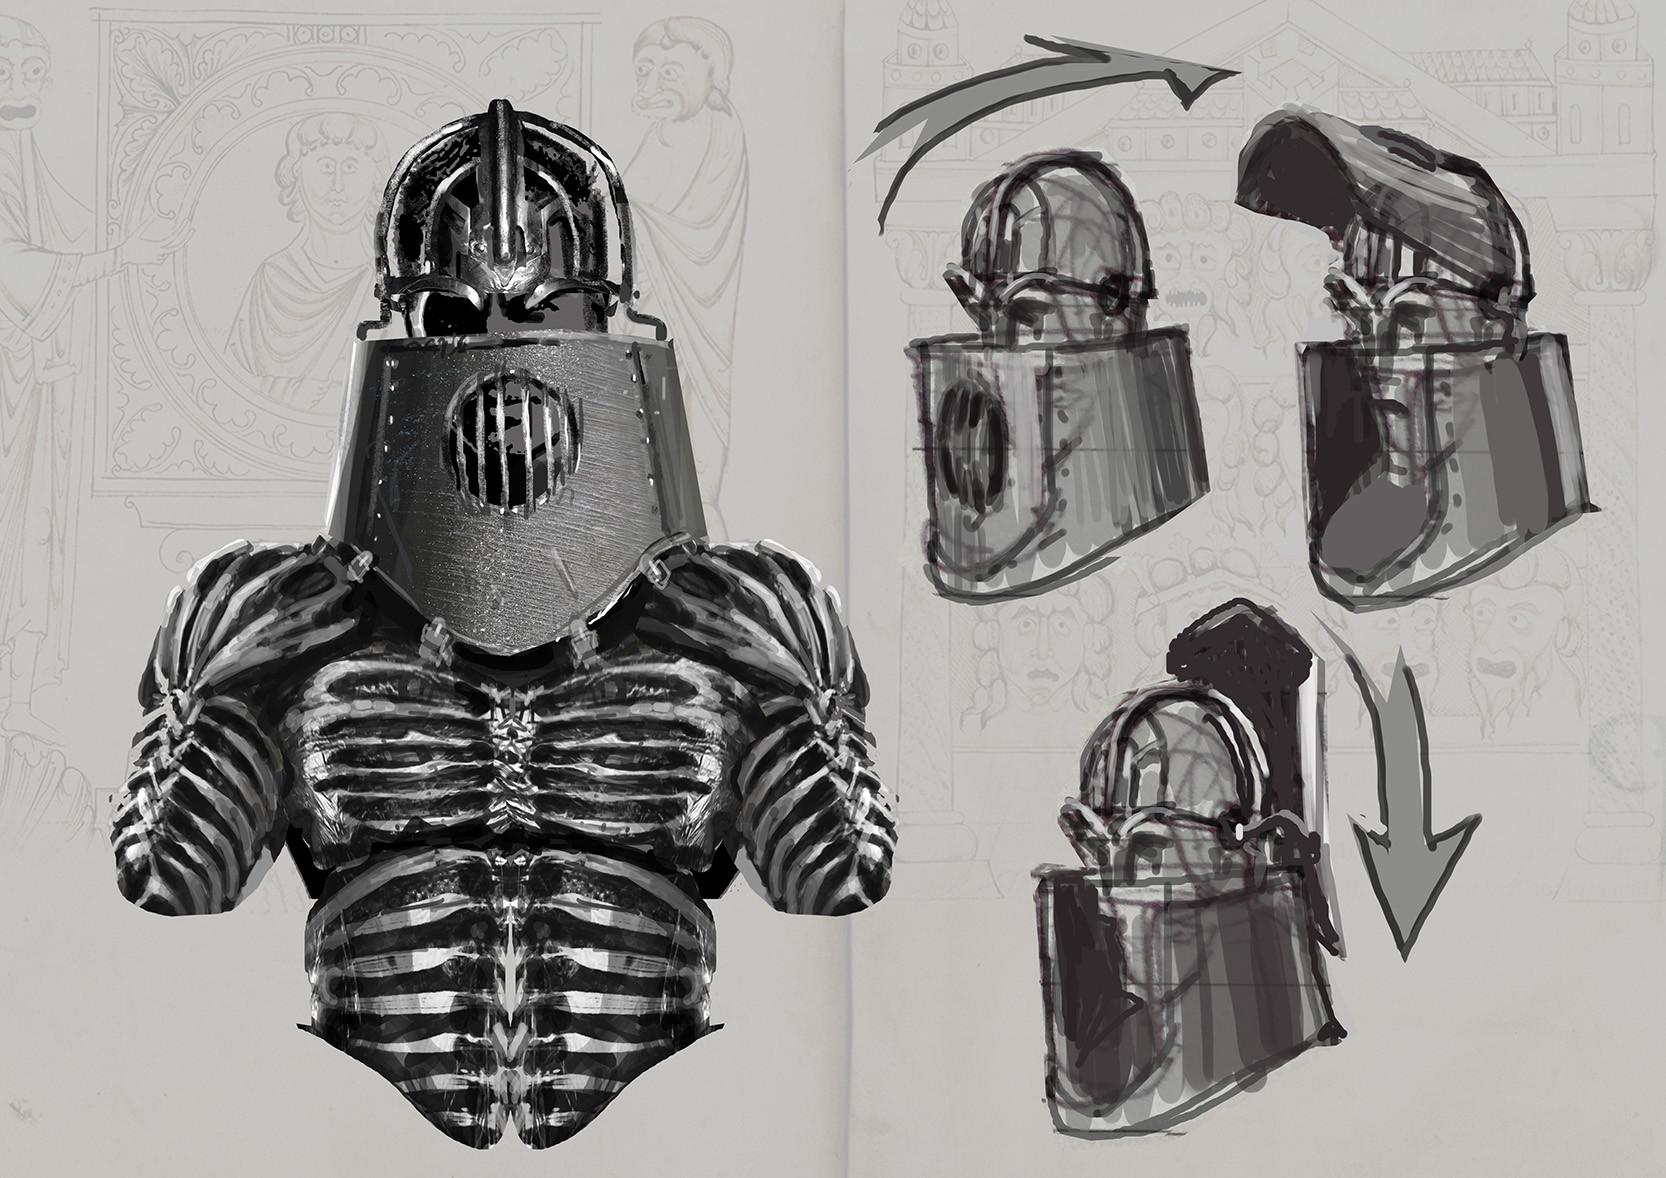 Andrei riabovitchev armor helmet v011